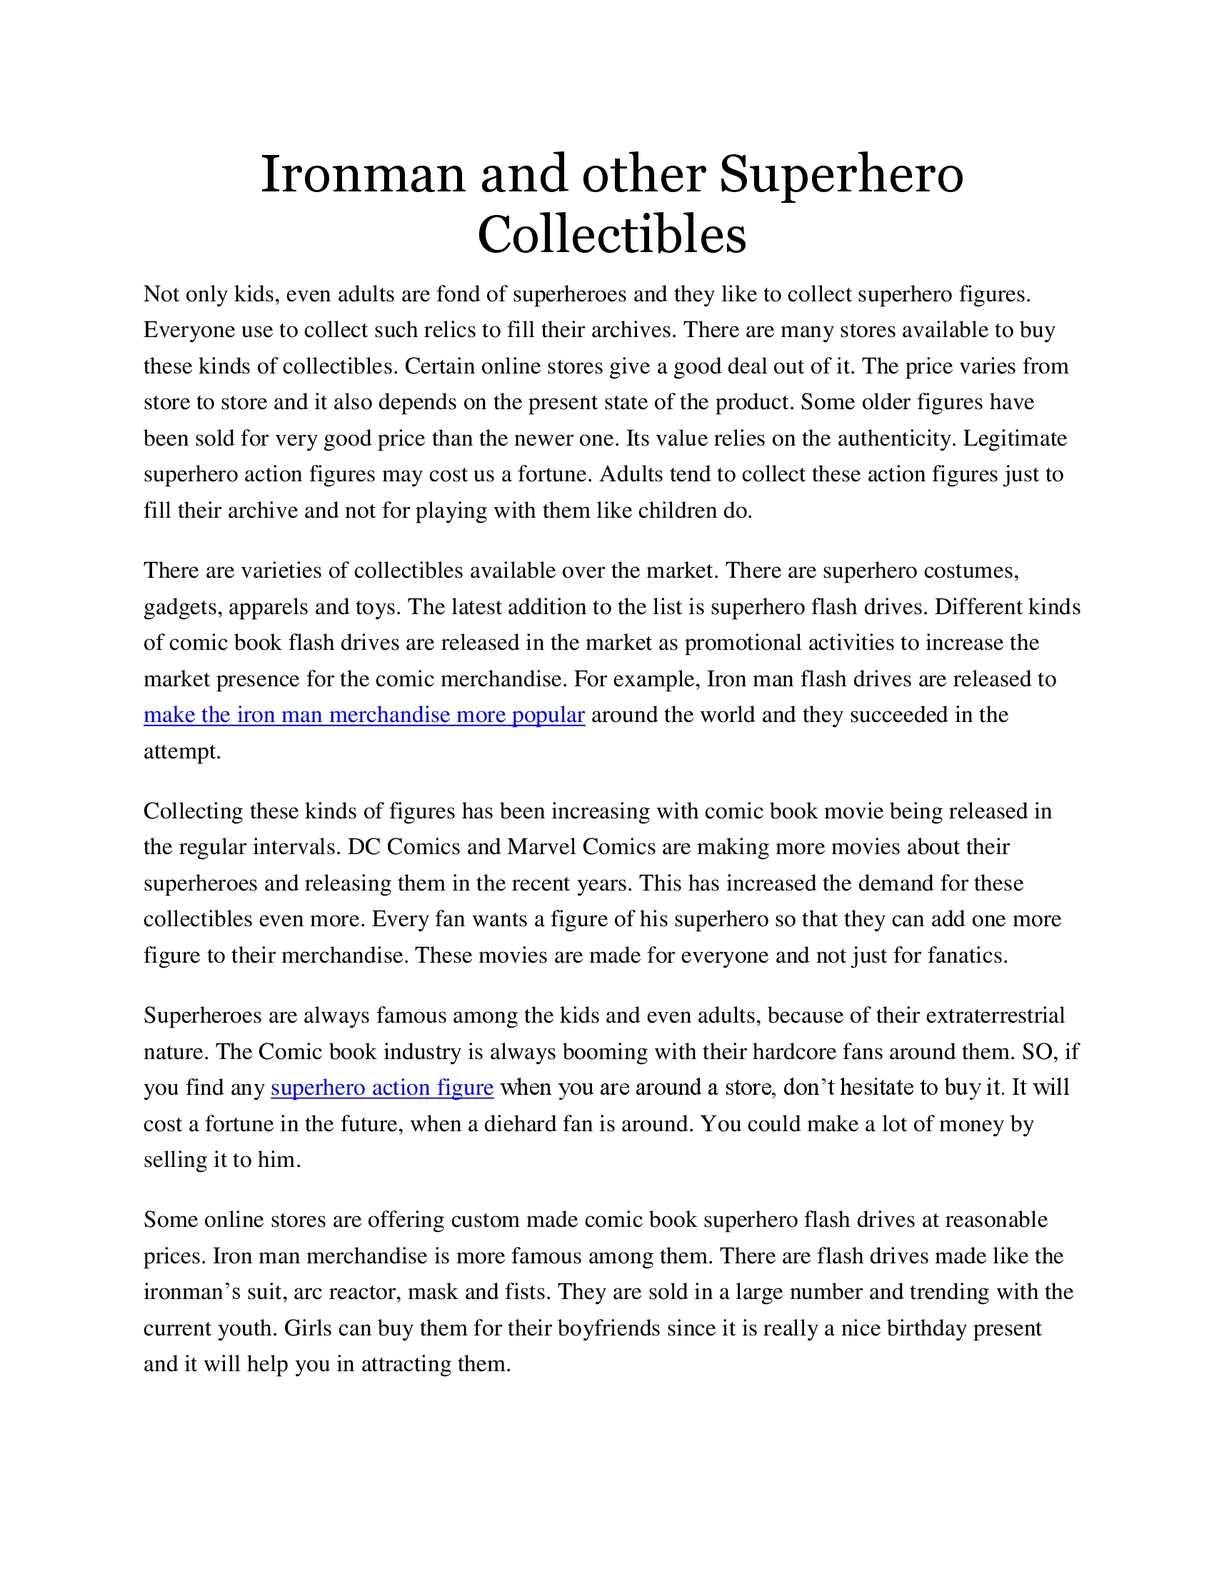 Calaméo - Ironman and other Superhero Collectibles